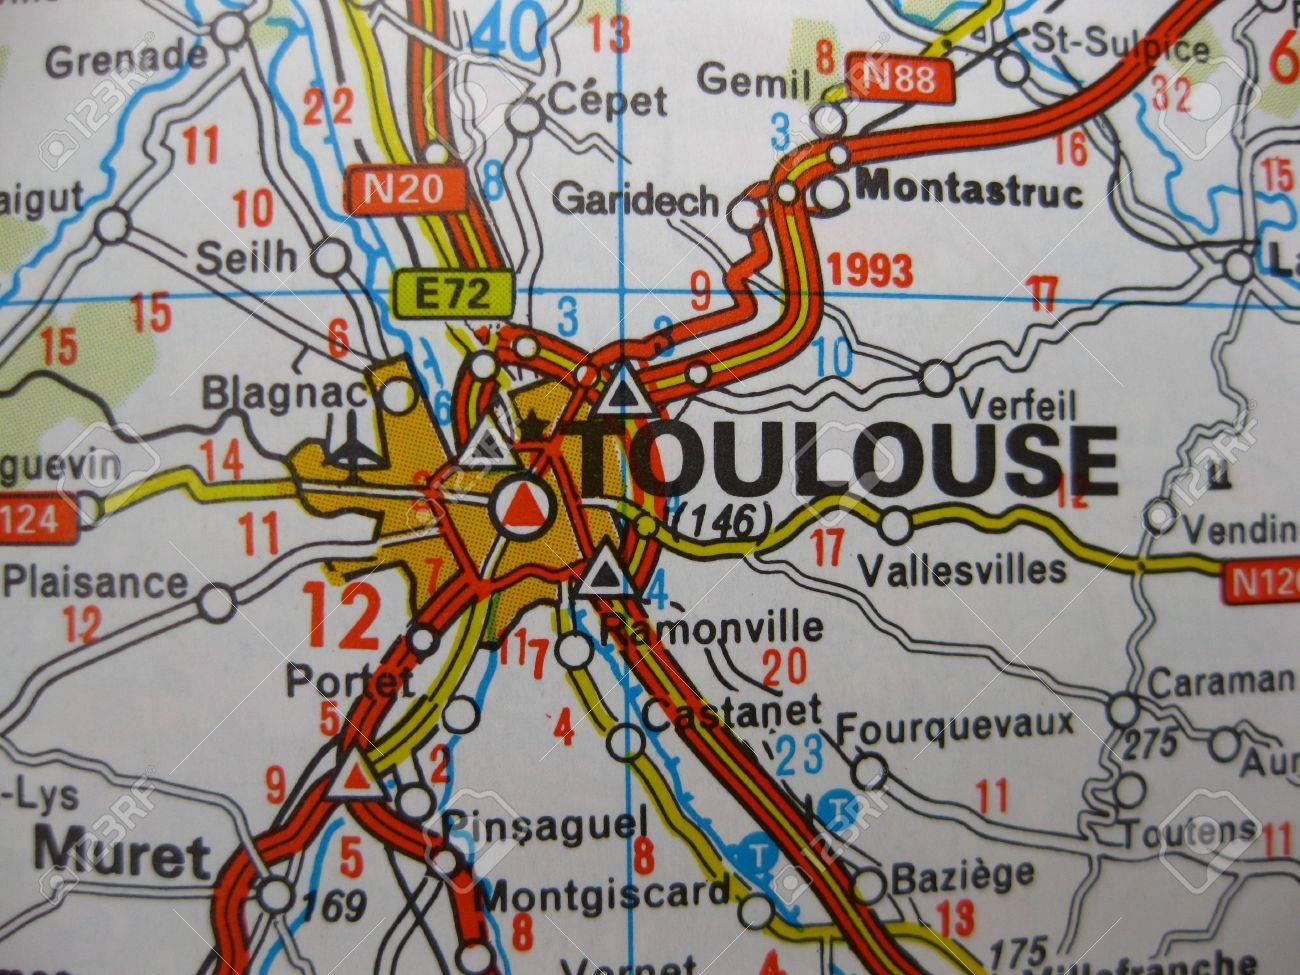 Mapa Turistico De Toulouse.Europa En Siete Dias Mapa De Toulouse Francia Fotos Retratos Imagenes Y Fotografia De Archivo Libres De Derecho Image 4998337